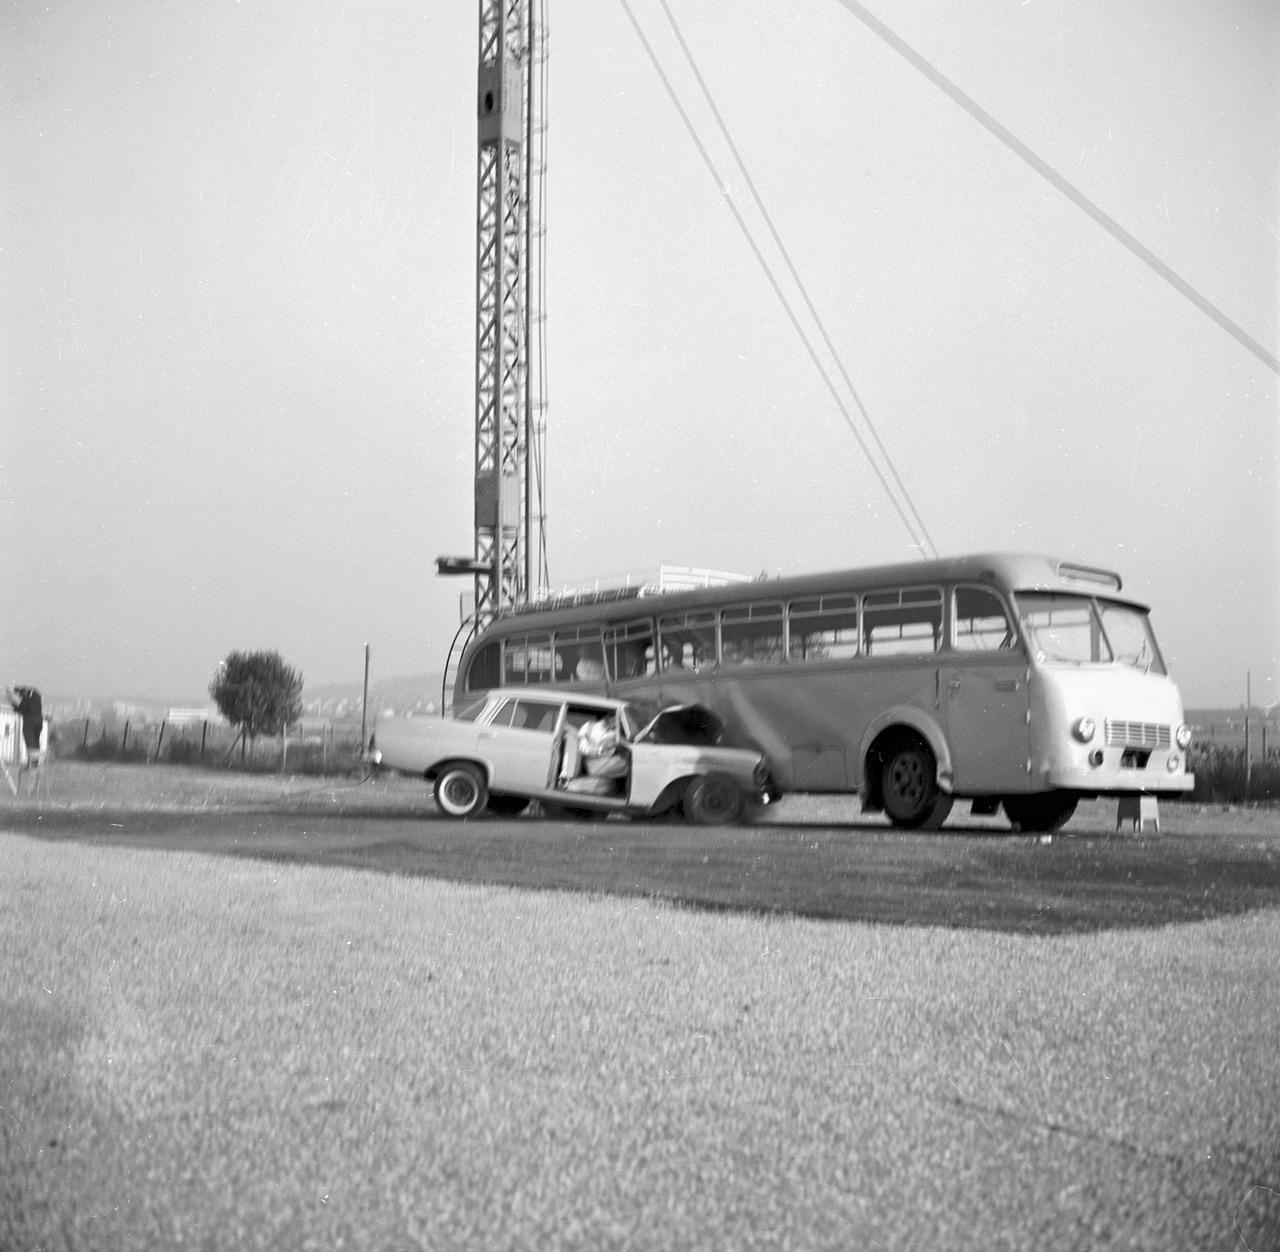 1959 mercedes benz w111 fintail mercedes benz for Mercedes benz edison service